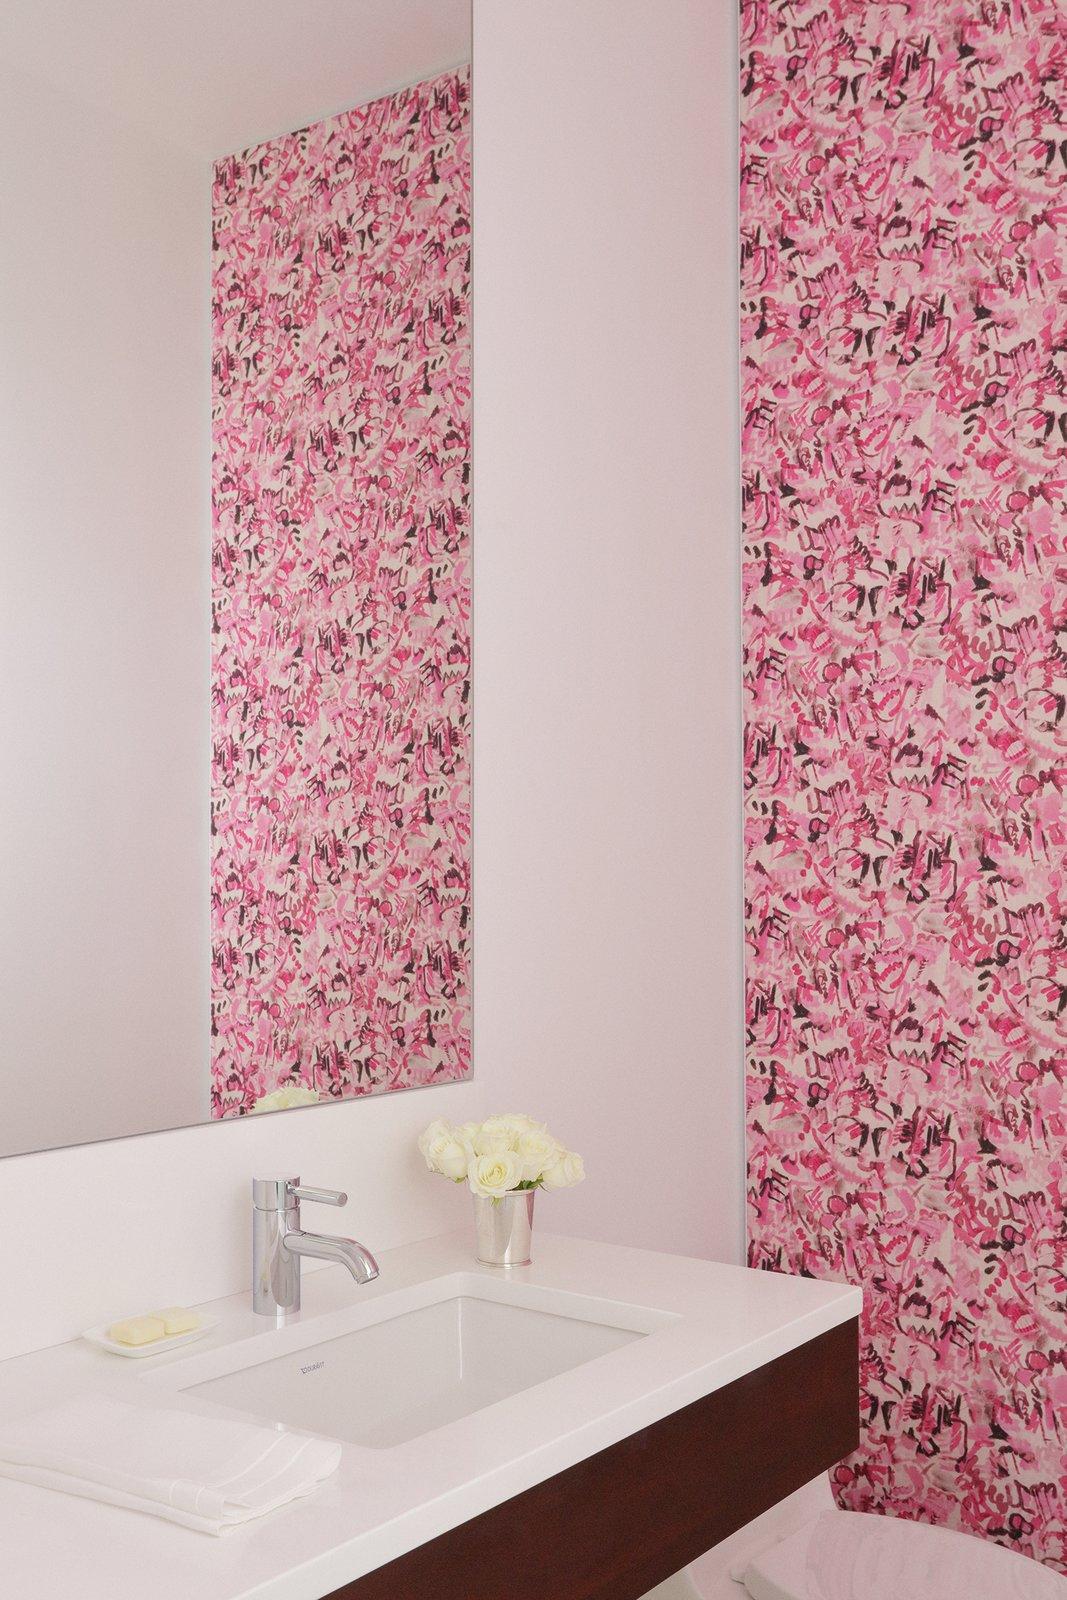 Bath Room, Engineered Quartz Counter, and Undermount Sink Powder Room  The Hearn House